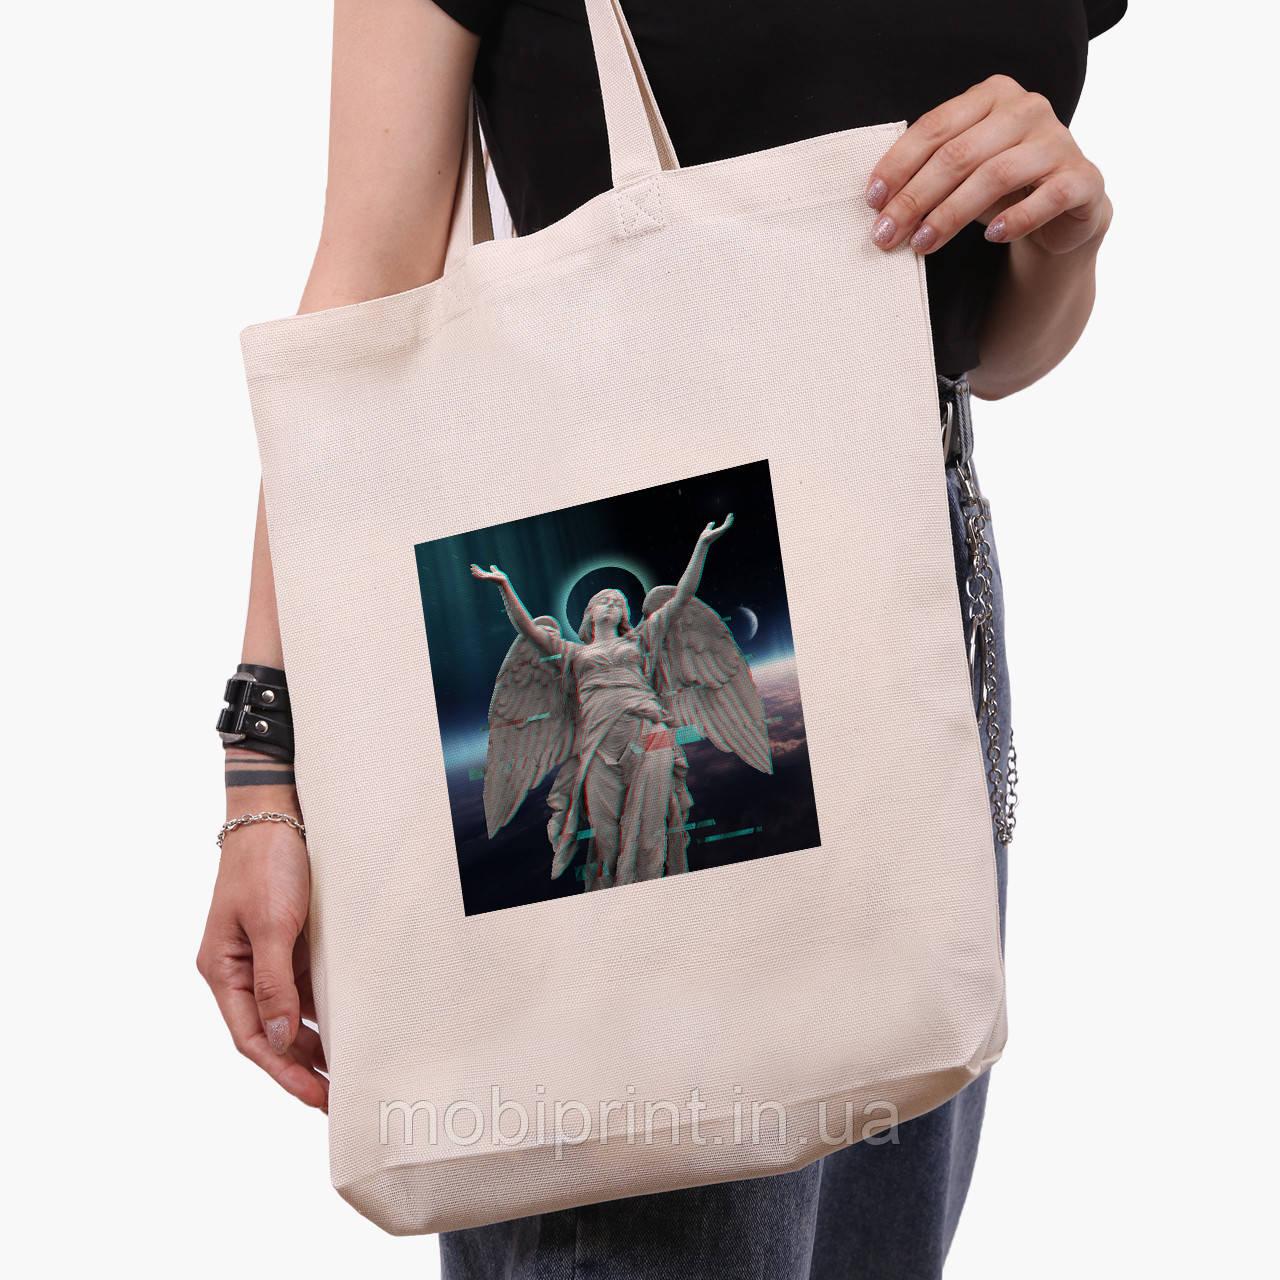 Эко сумка шоппер белая Ренессанс-Ангел (Angel) (9227-1592-1)  экосумка шопер 41*39*8 см